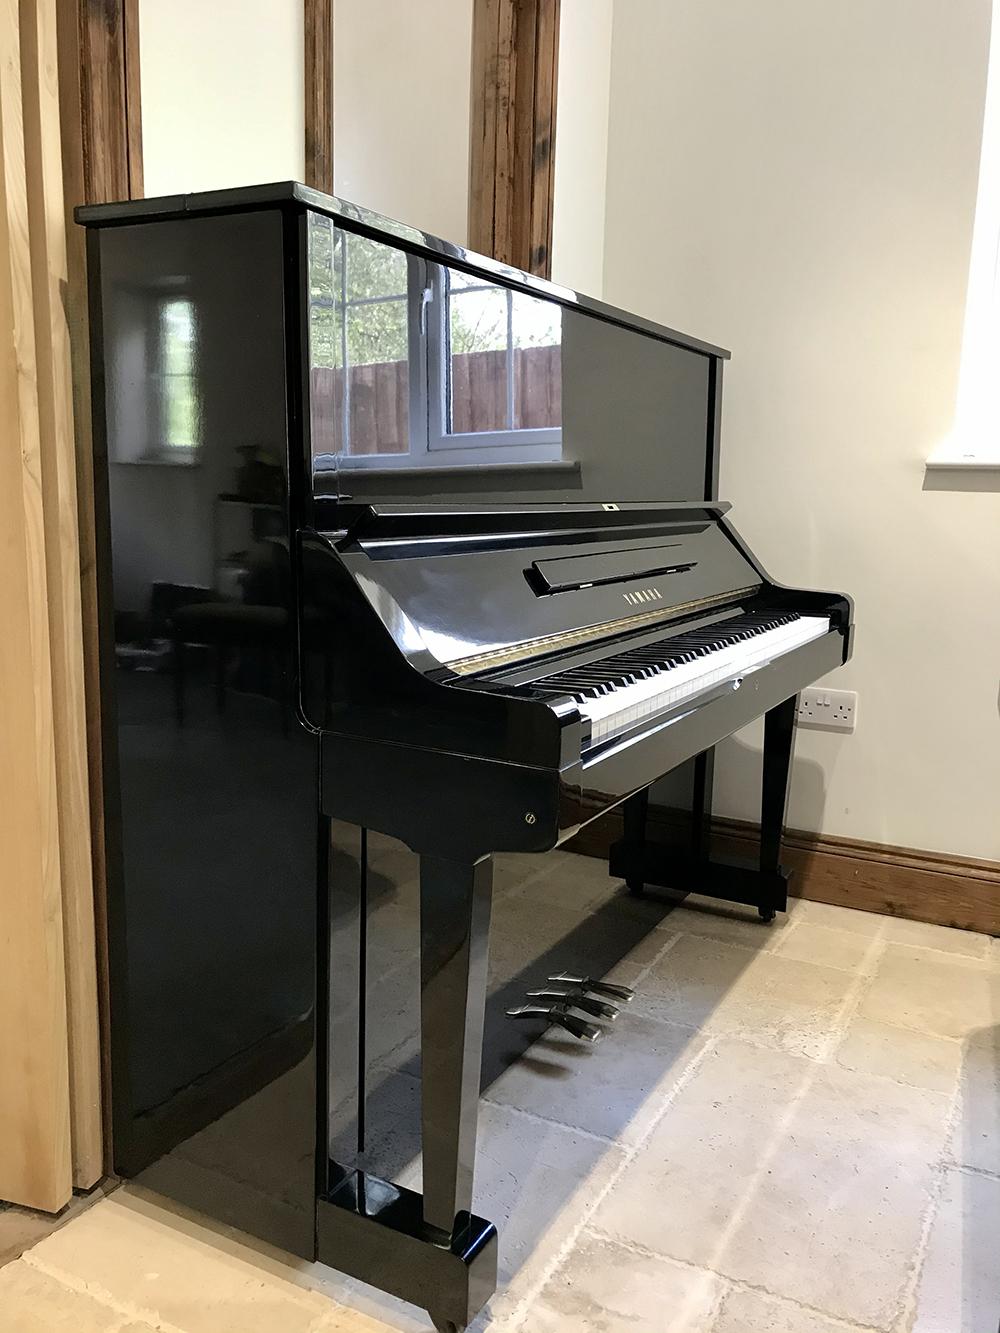 Yamaha-Piano-Dorset-U3-X-7.jpg